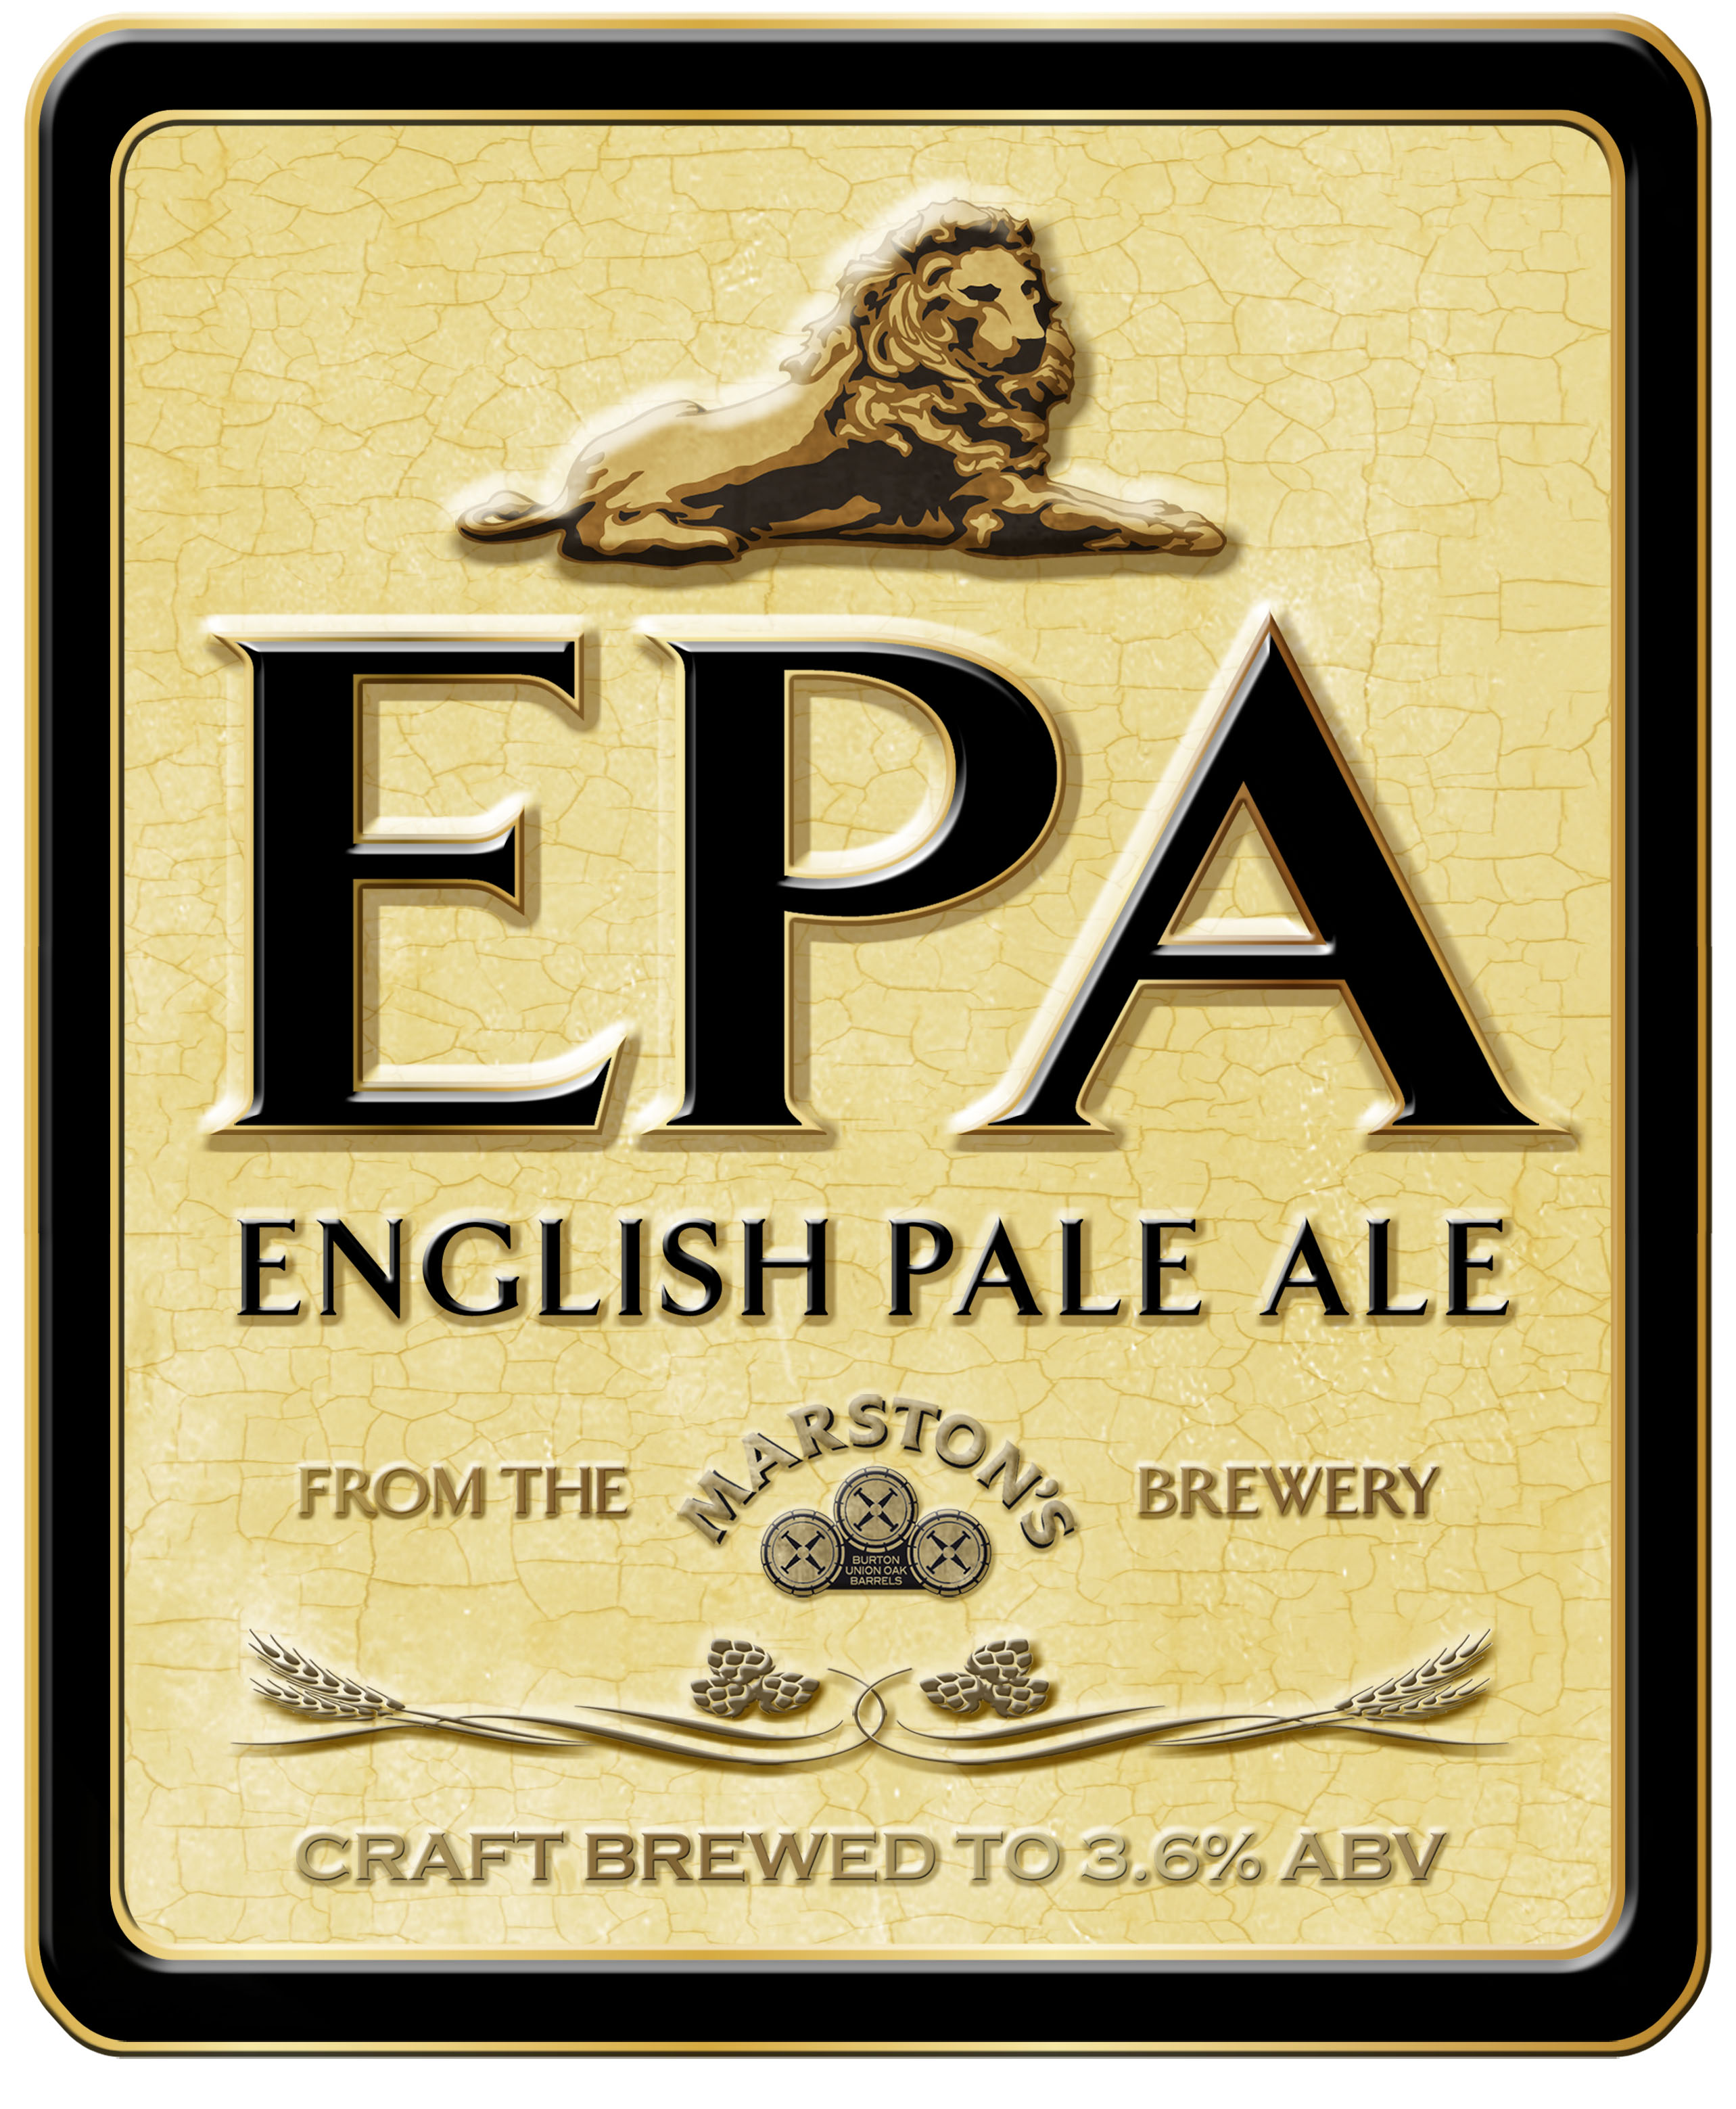 EPA - English Pale Ale